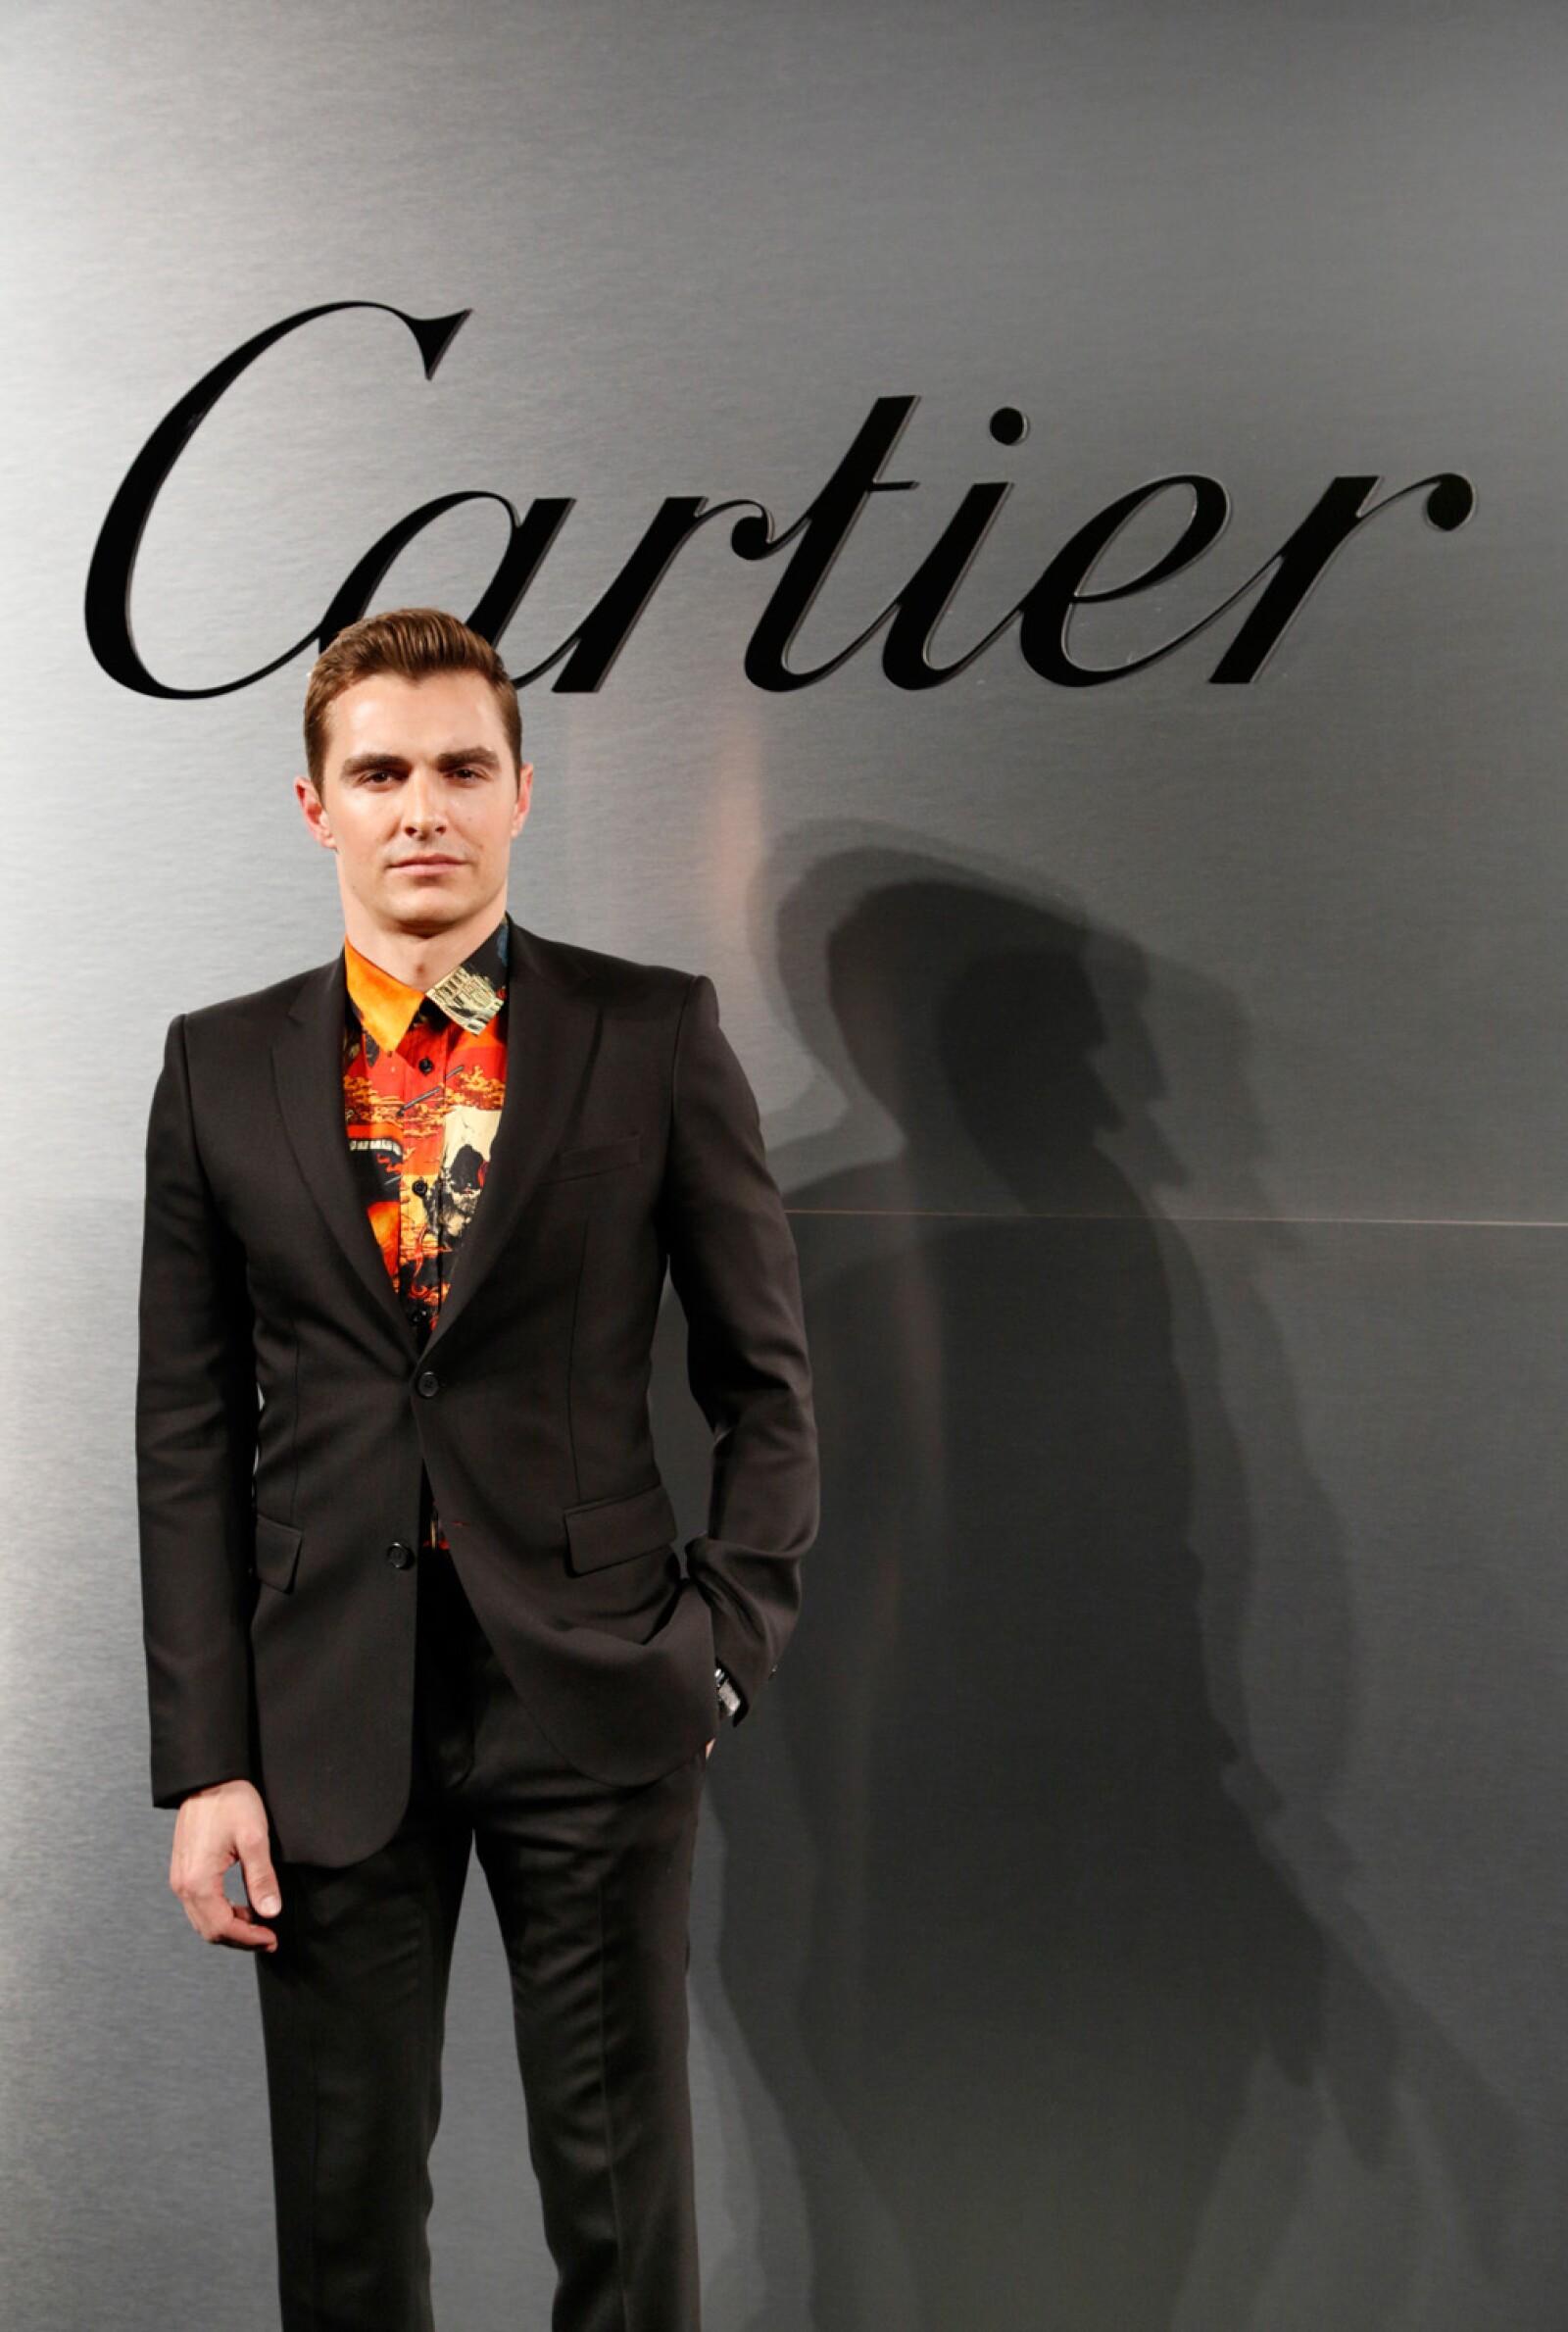 775150747LC00059_Cartier_Ce